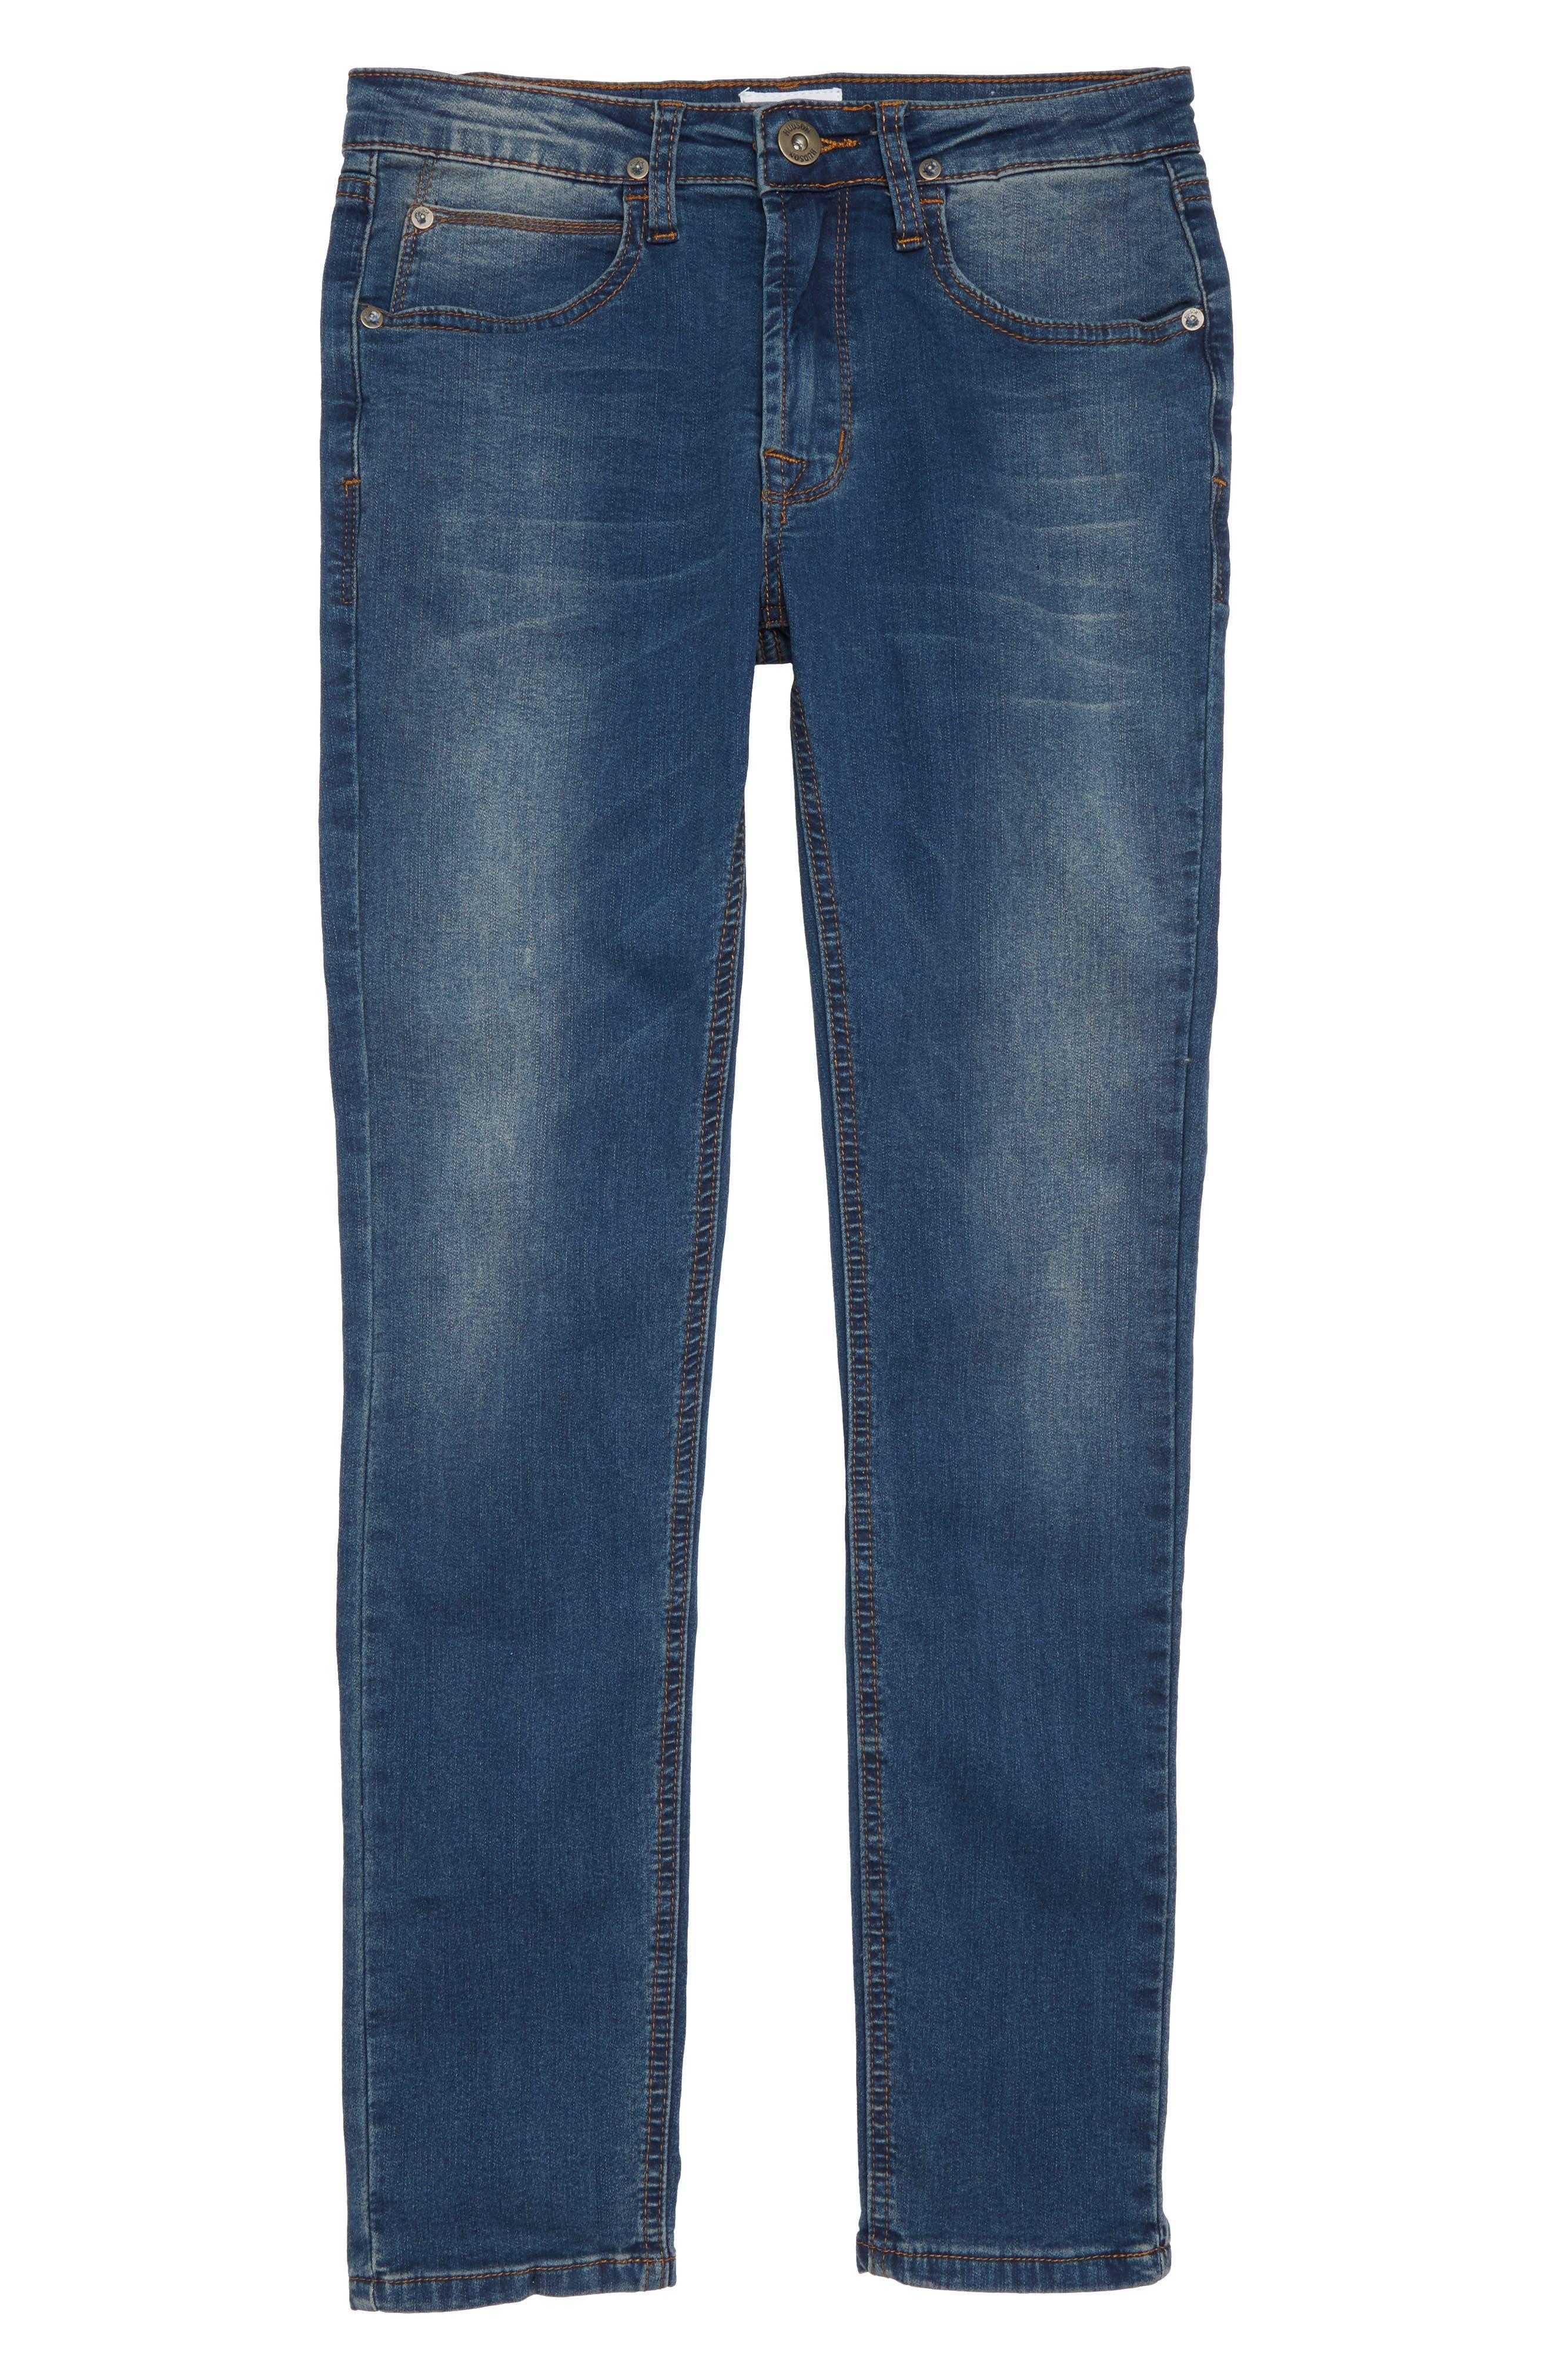 Jagger Slim Fit Straight Leg Jeans,                         Main,                         color, Beaten Blue